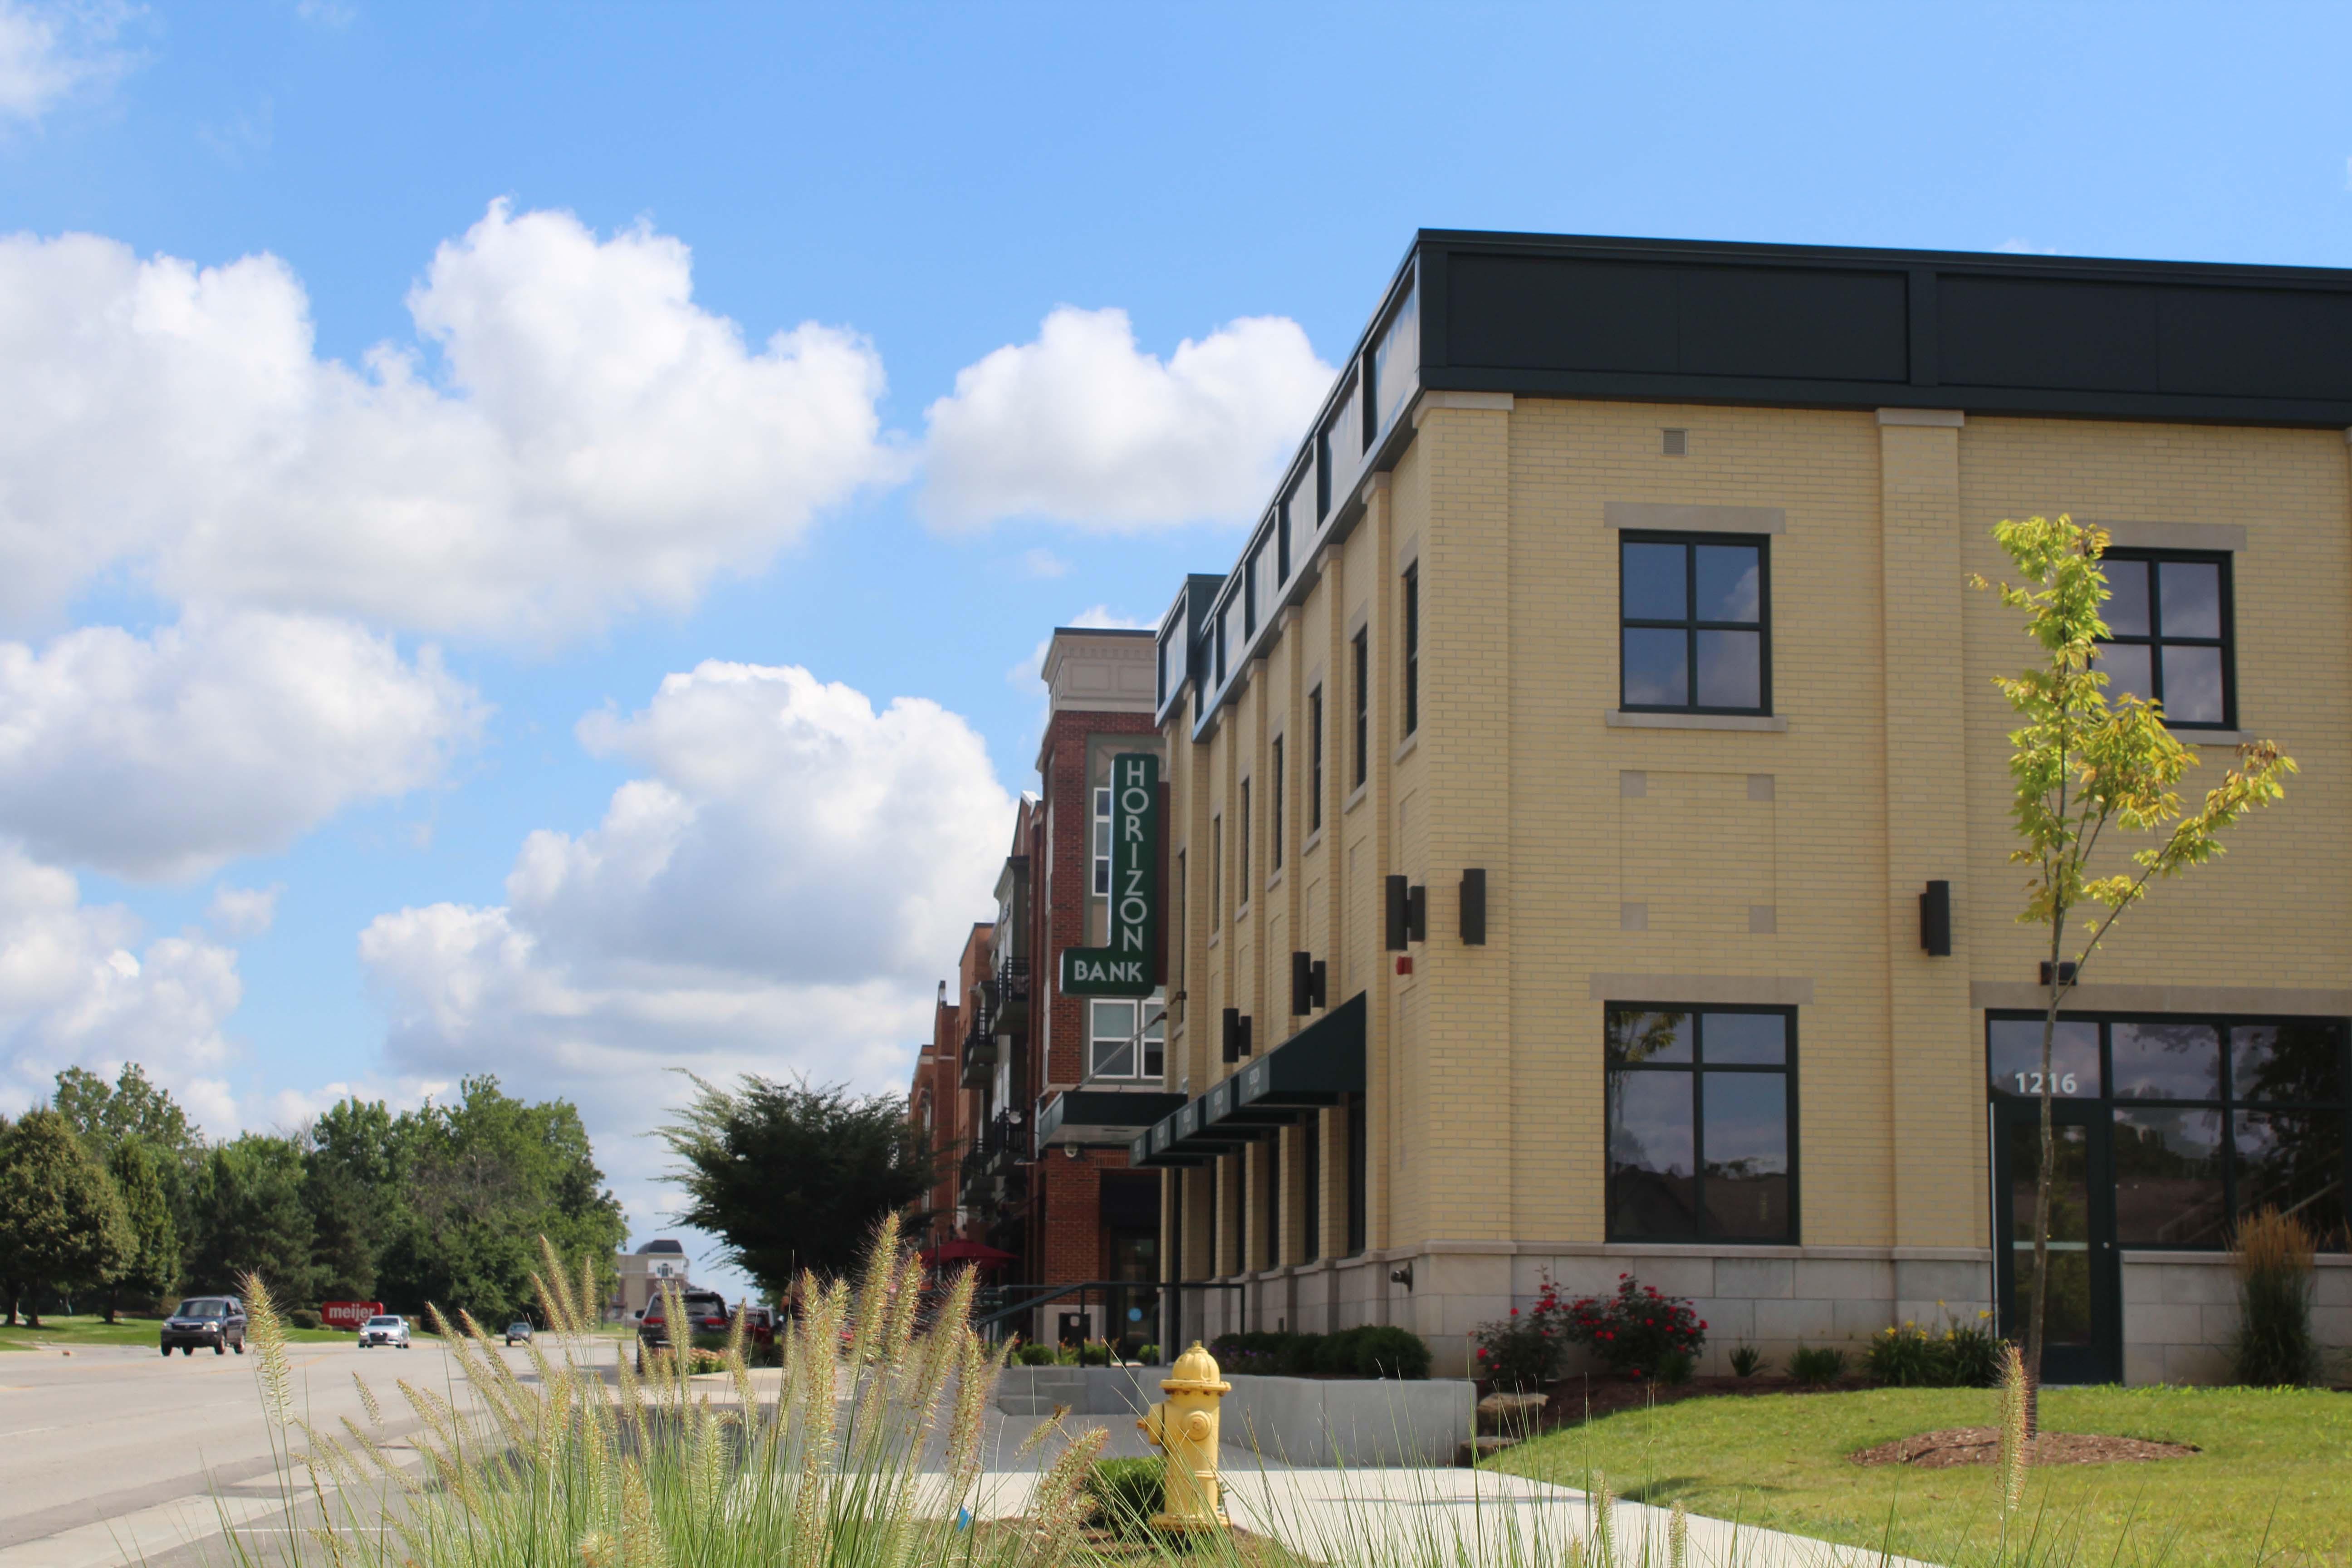 Horizon Bank Carmel exterior back view